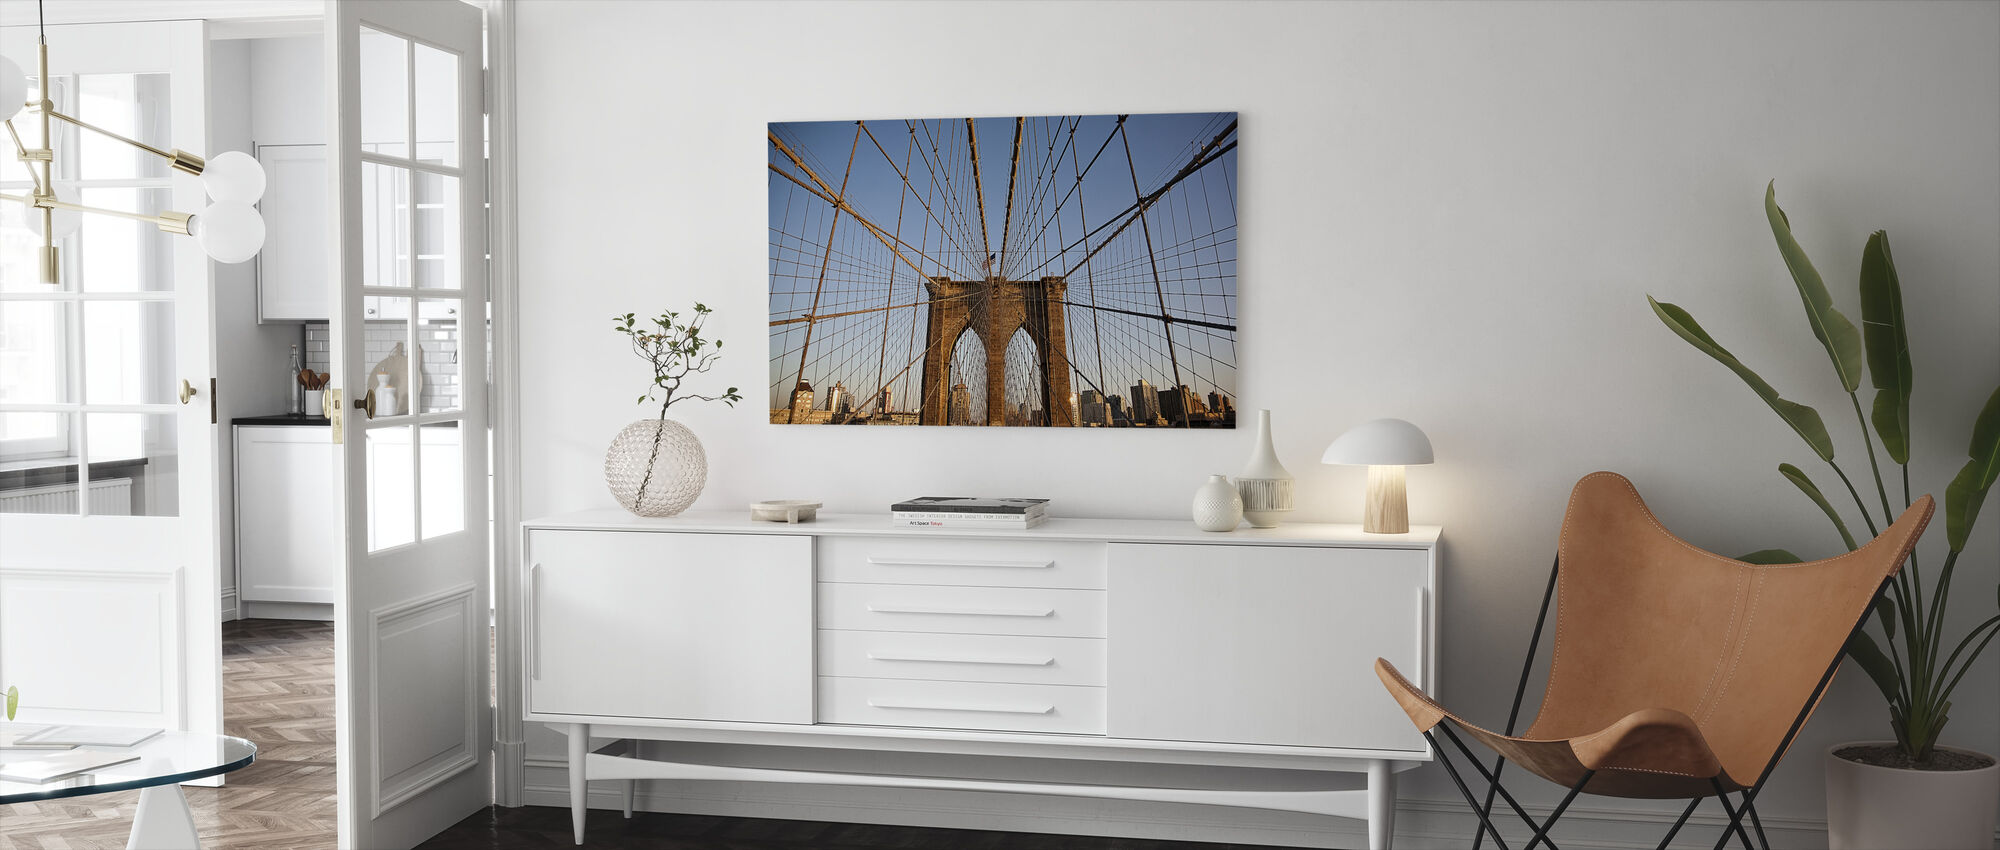 Suspension Wires on Urban Bridge - Canvas print - Living Room